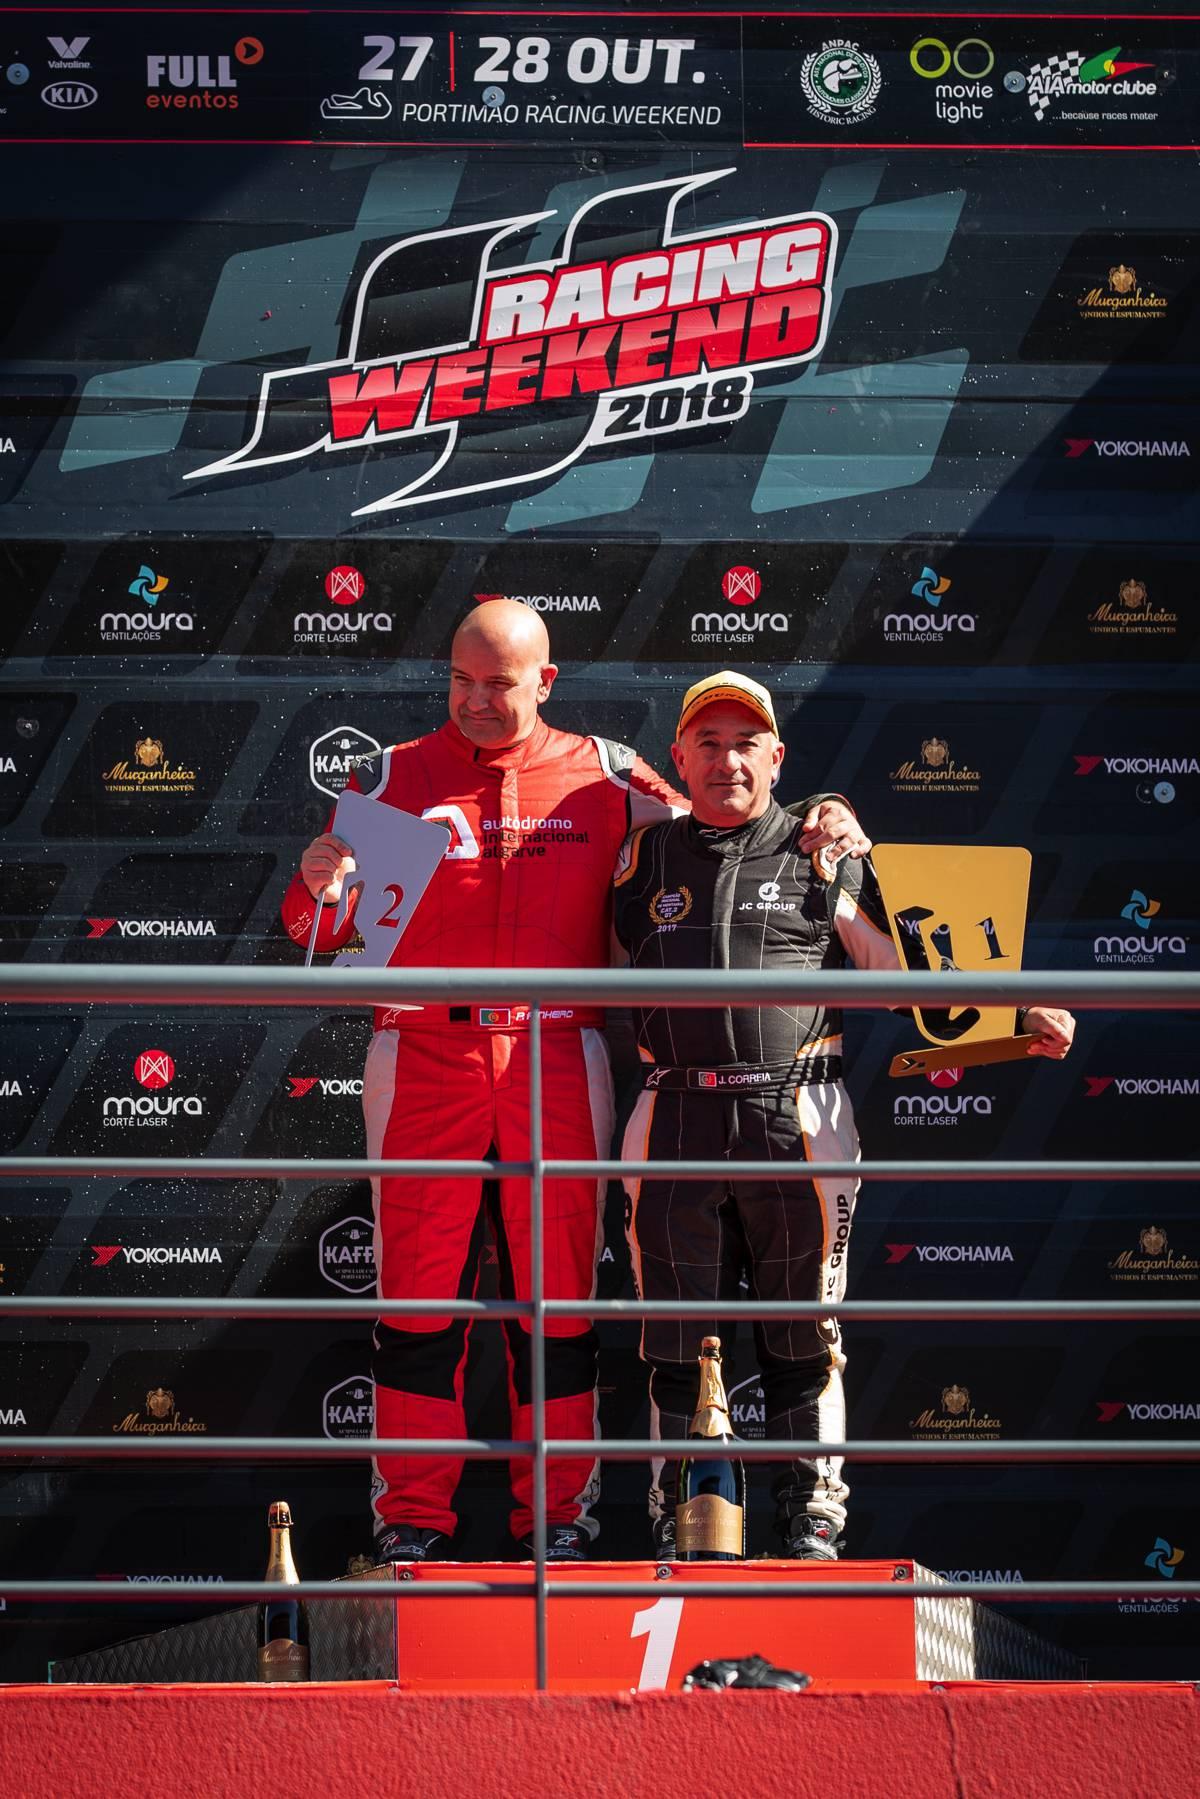 portimao podio supercars GT